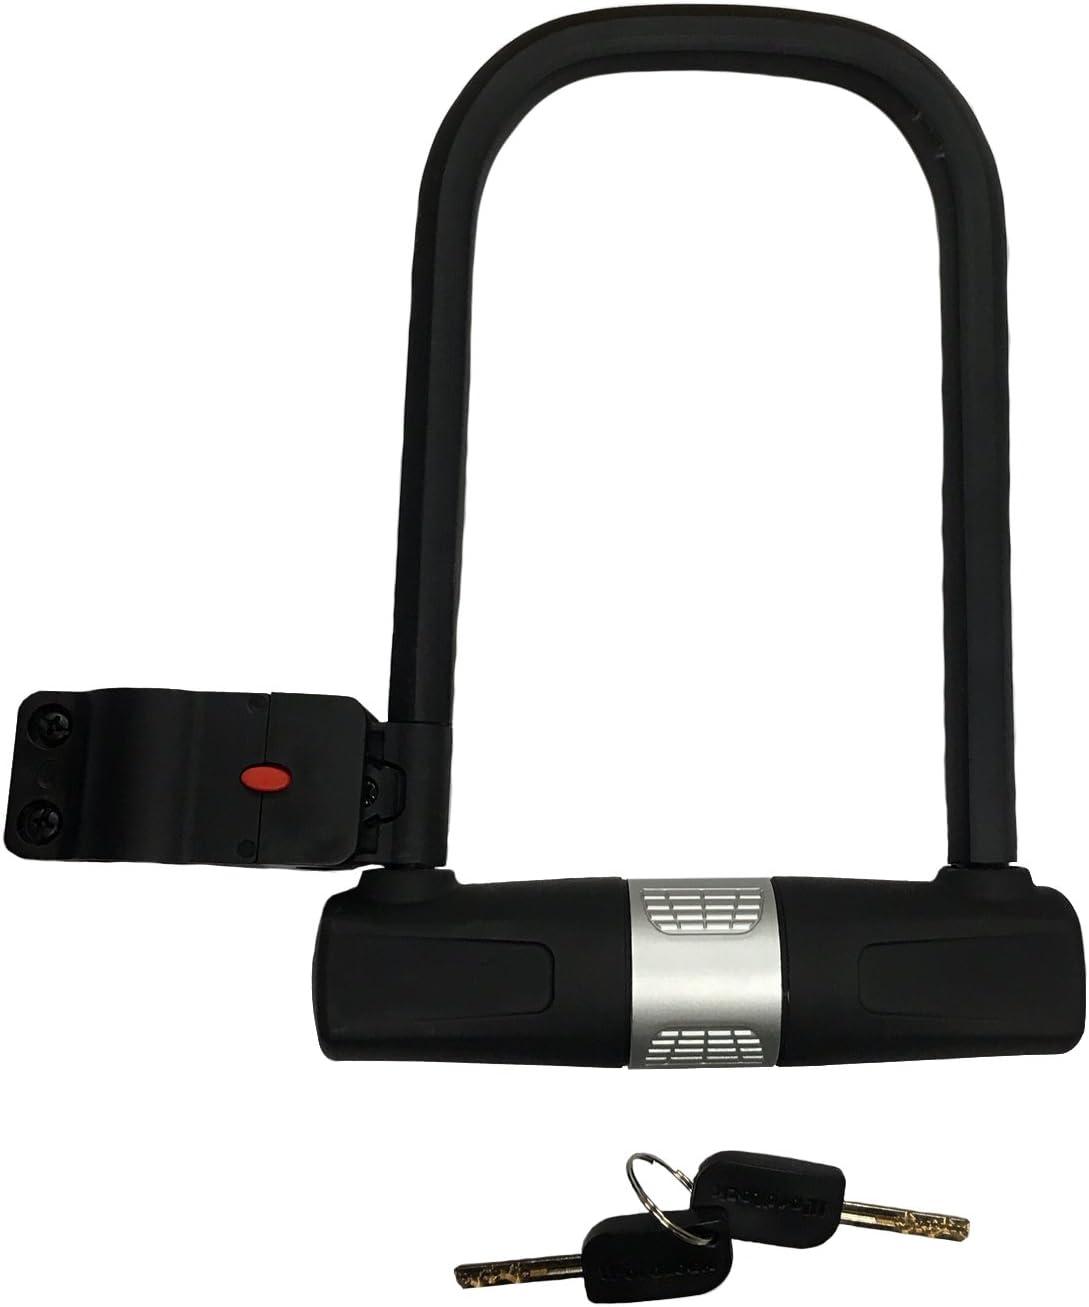 Metal Bicycle Lock Universal Bike Anti Theft Security Lock with 2 Keys #LY